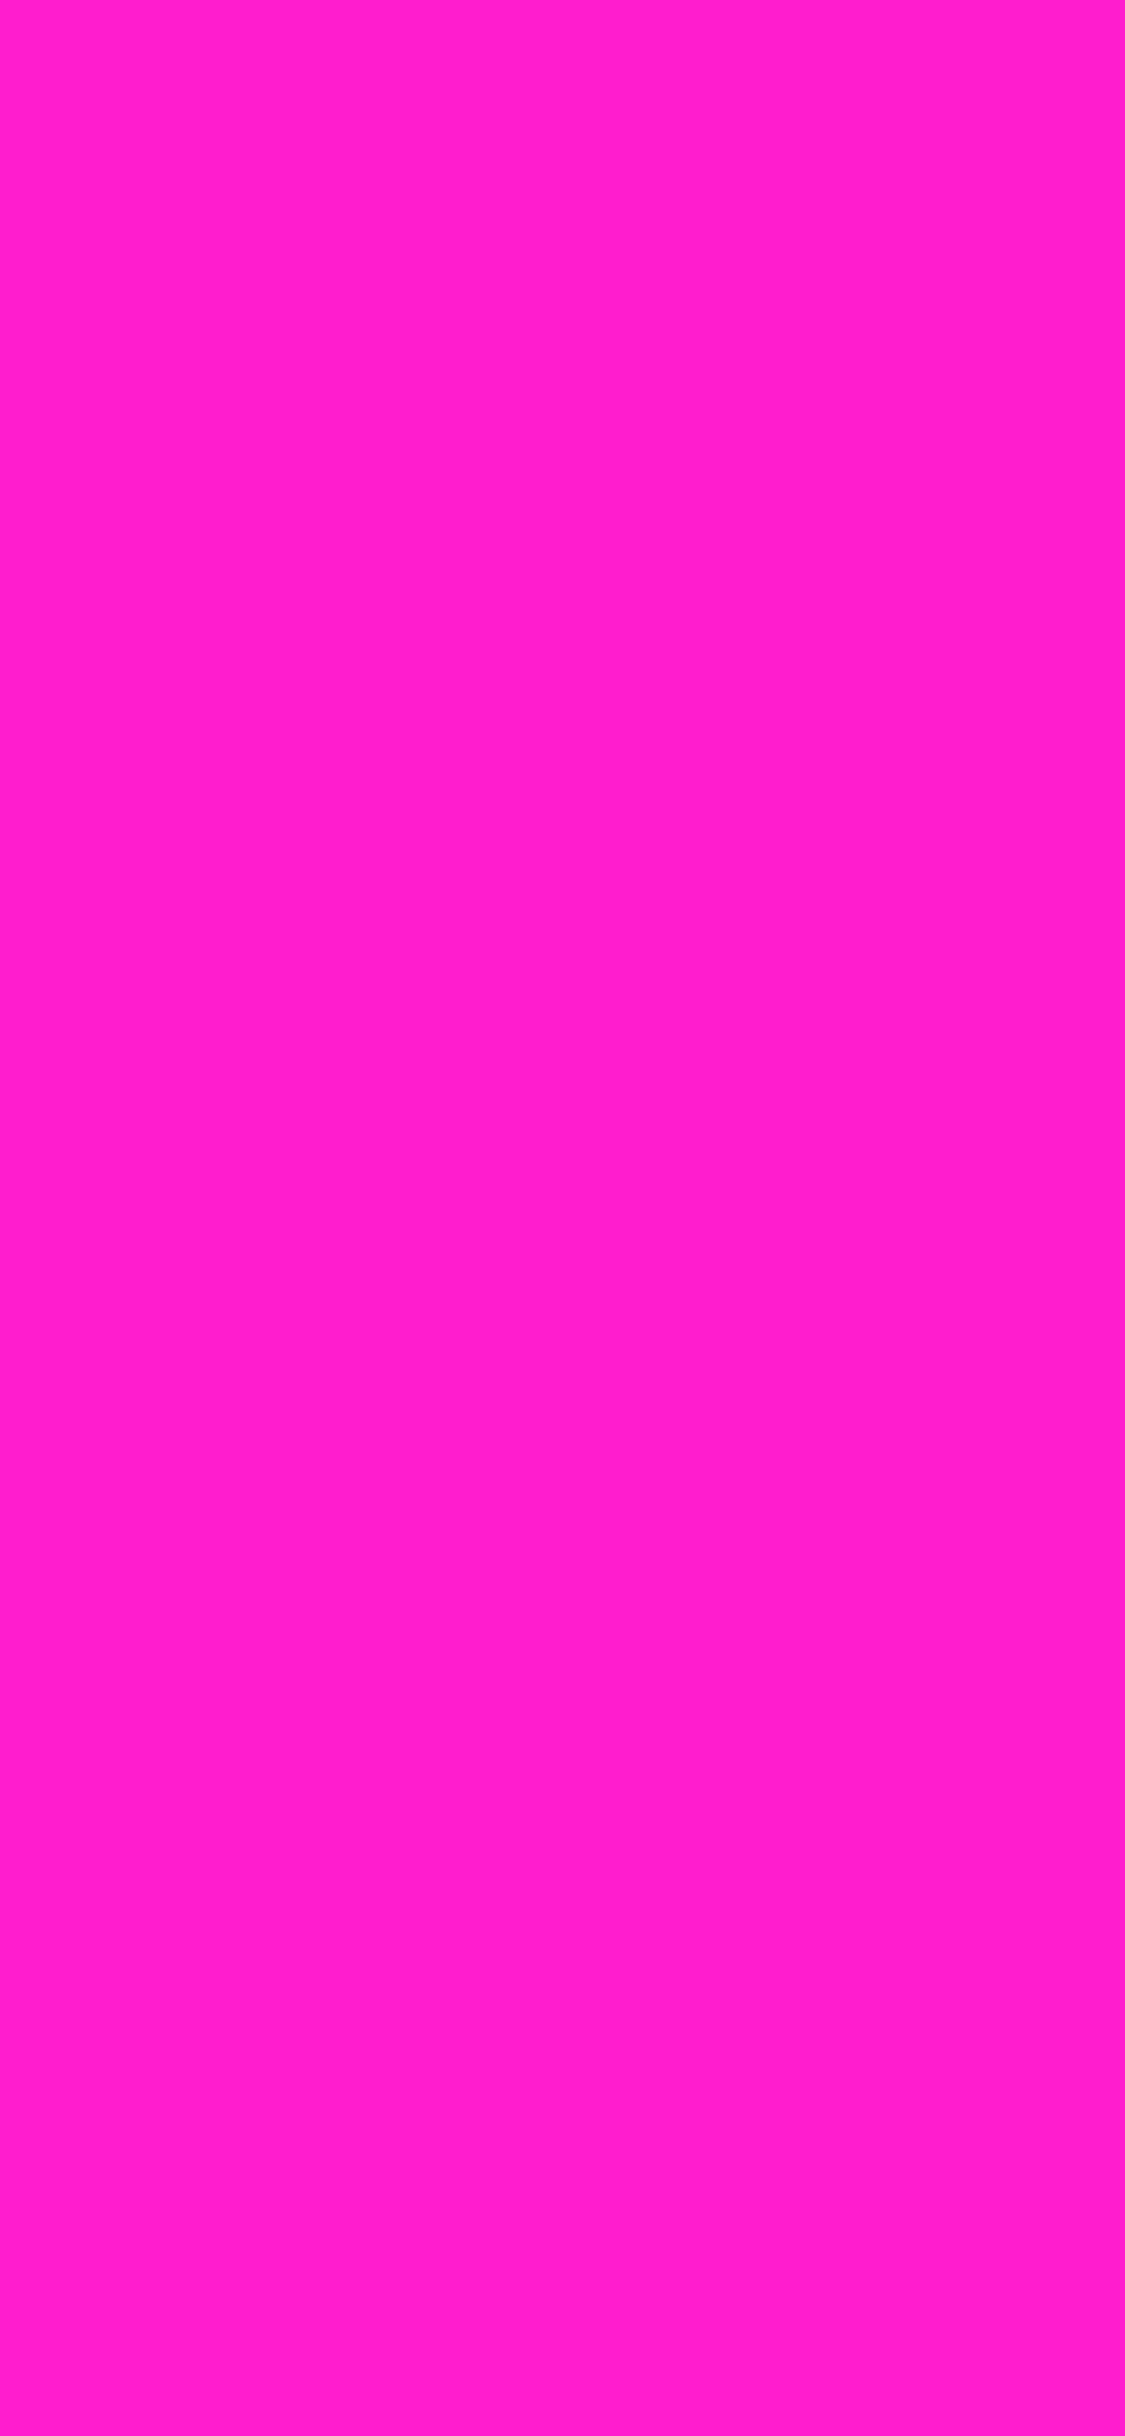 1125x2436 Hot Magenta Solid Color Background